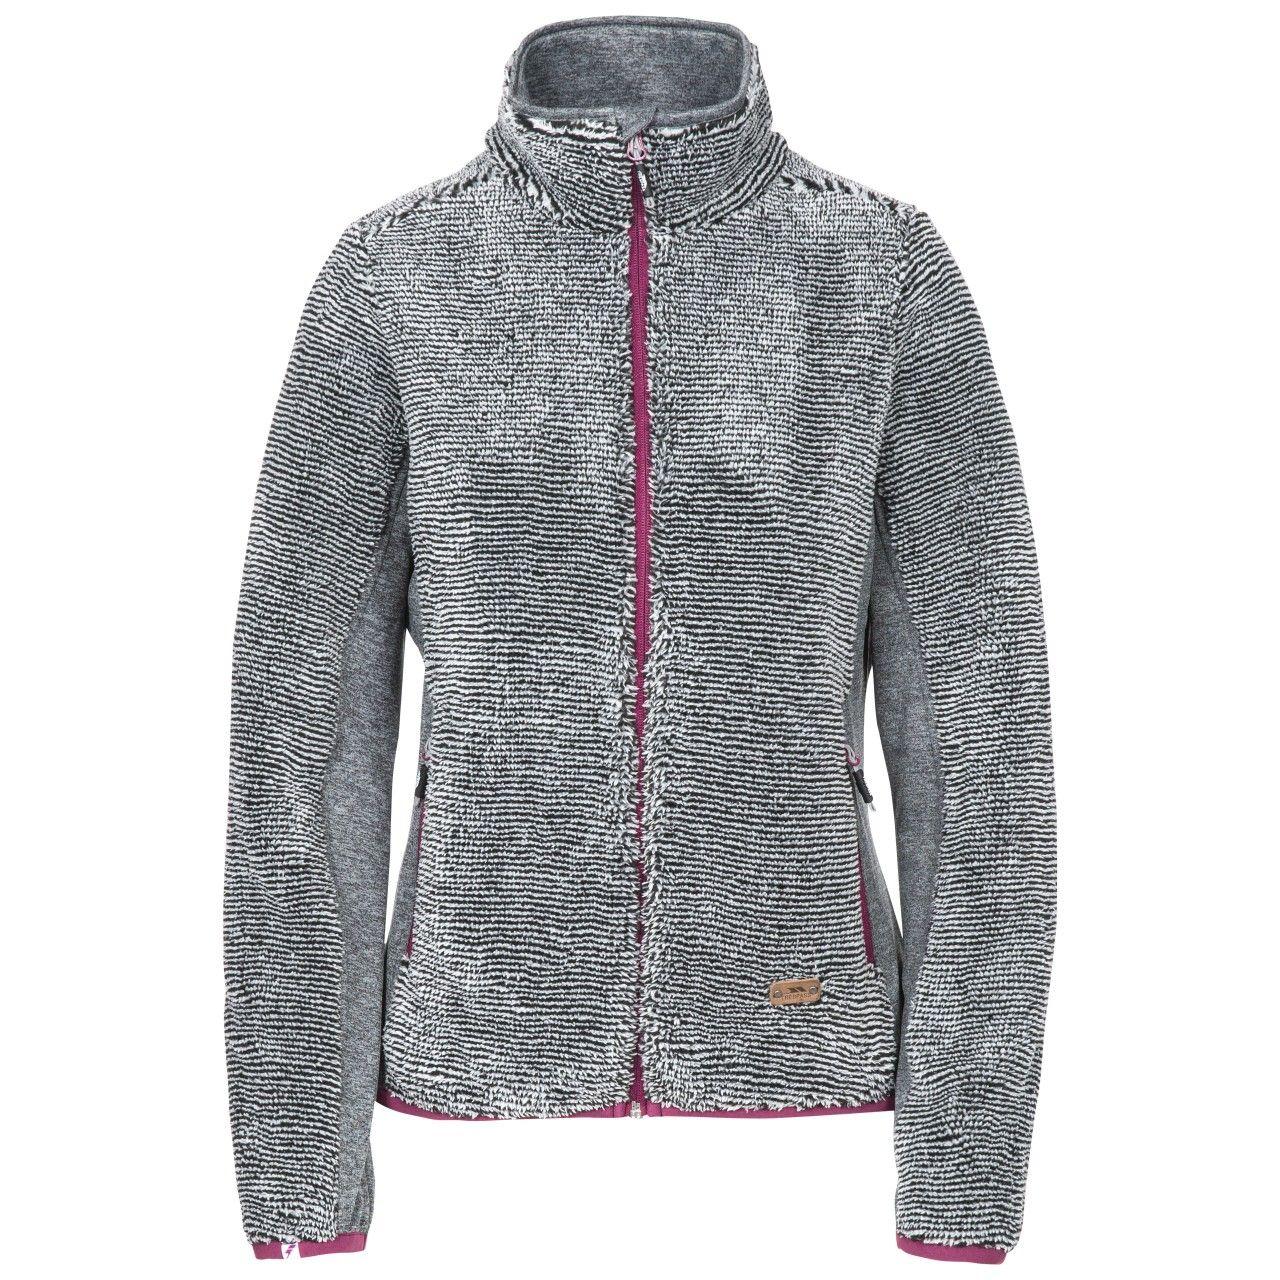 Trespass Womens/Ladies Muirhead Fleece Jacket